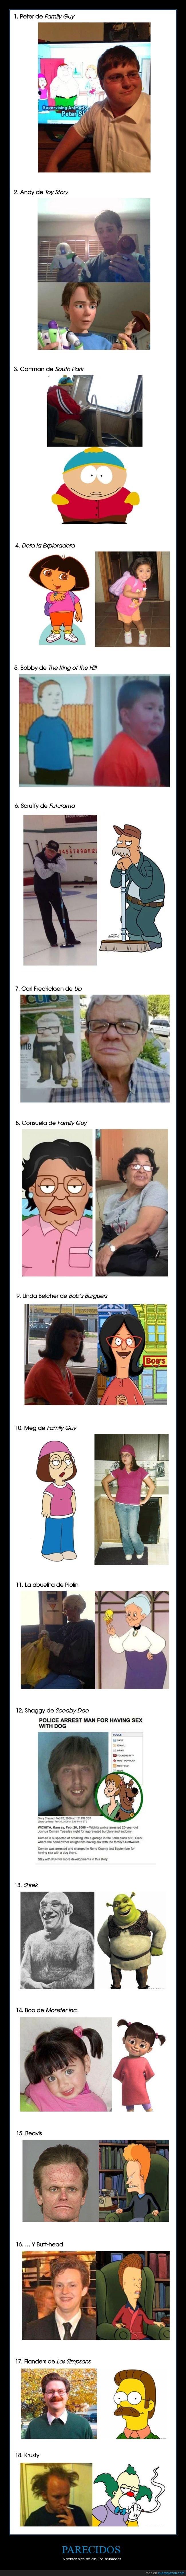 dibujos animados,parecidos